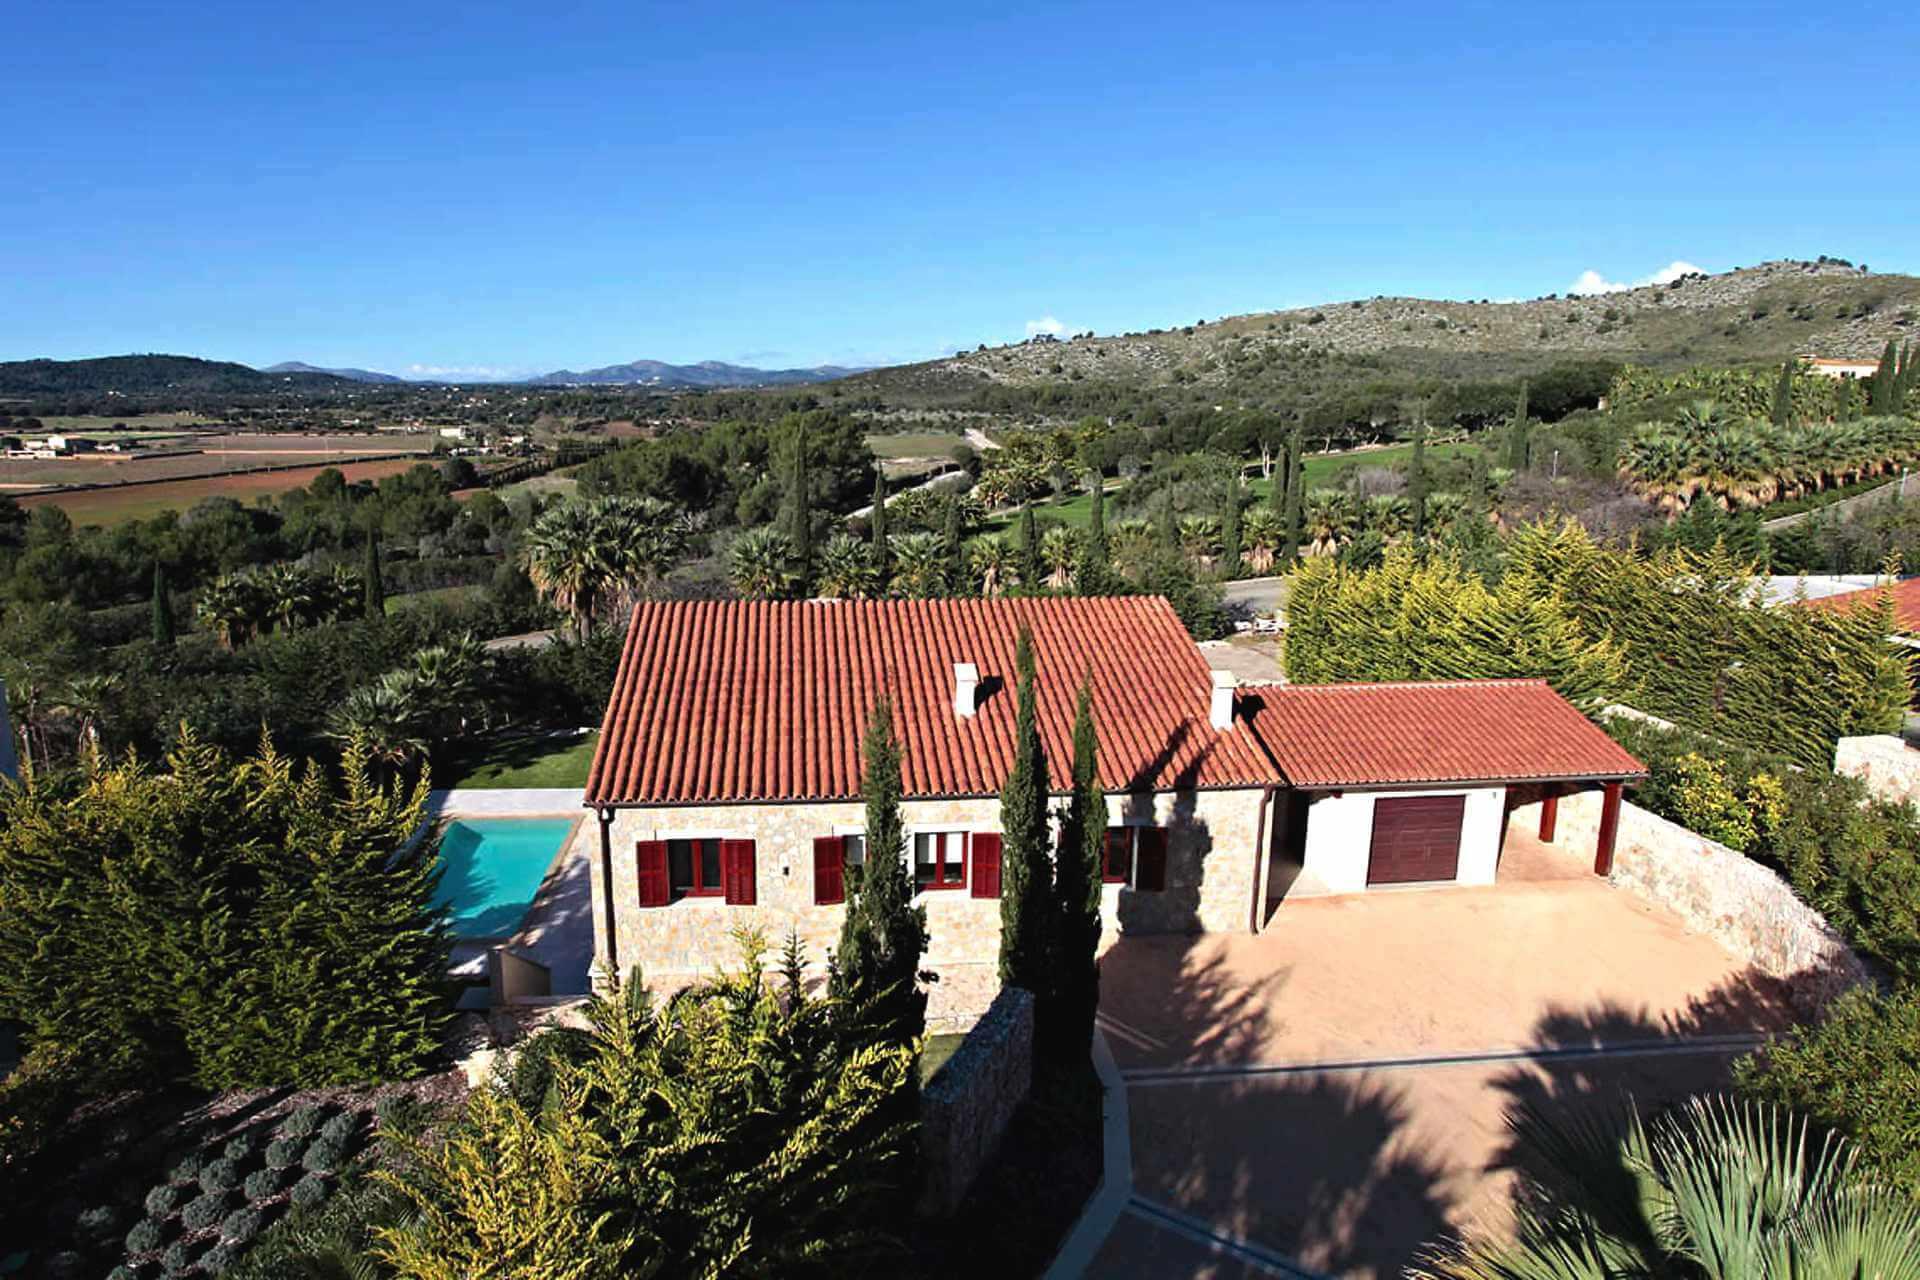 01-326 Design Villa Golfplatz Nordosten Mallorca Bild 1